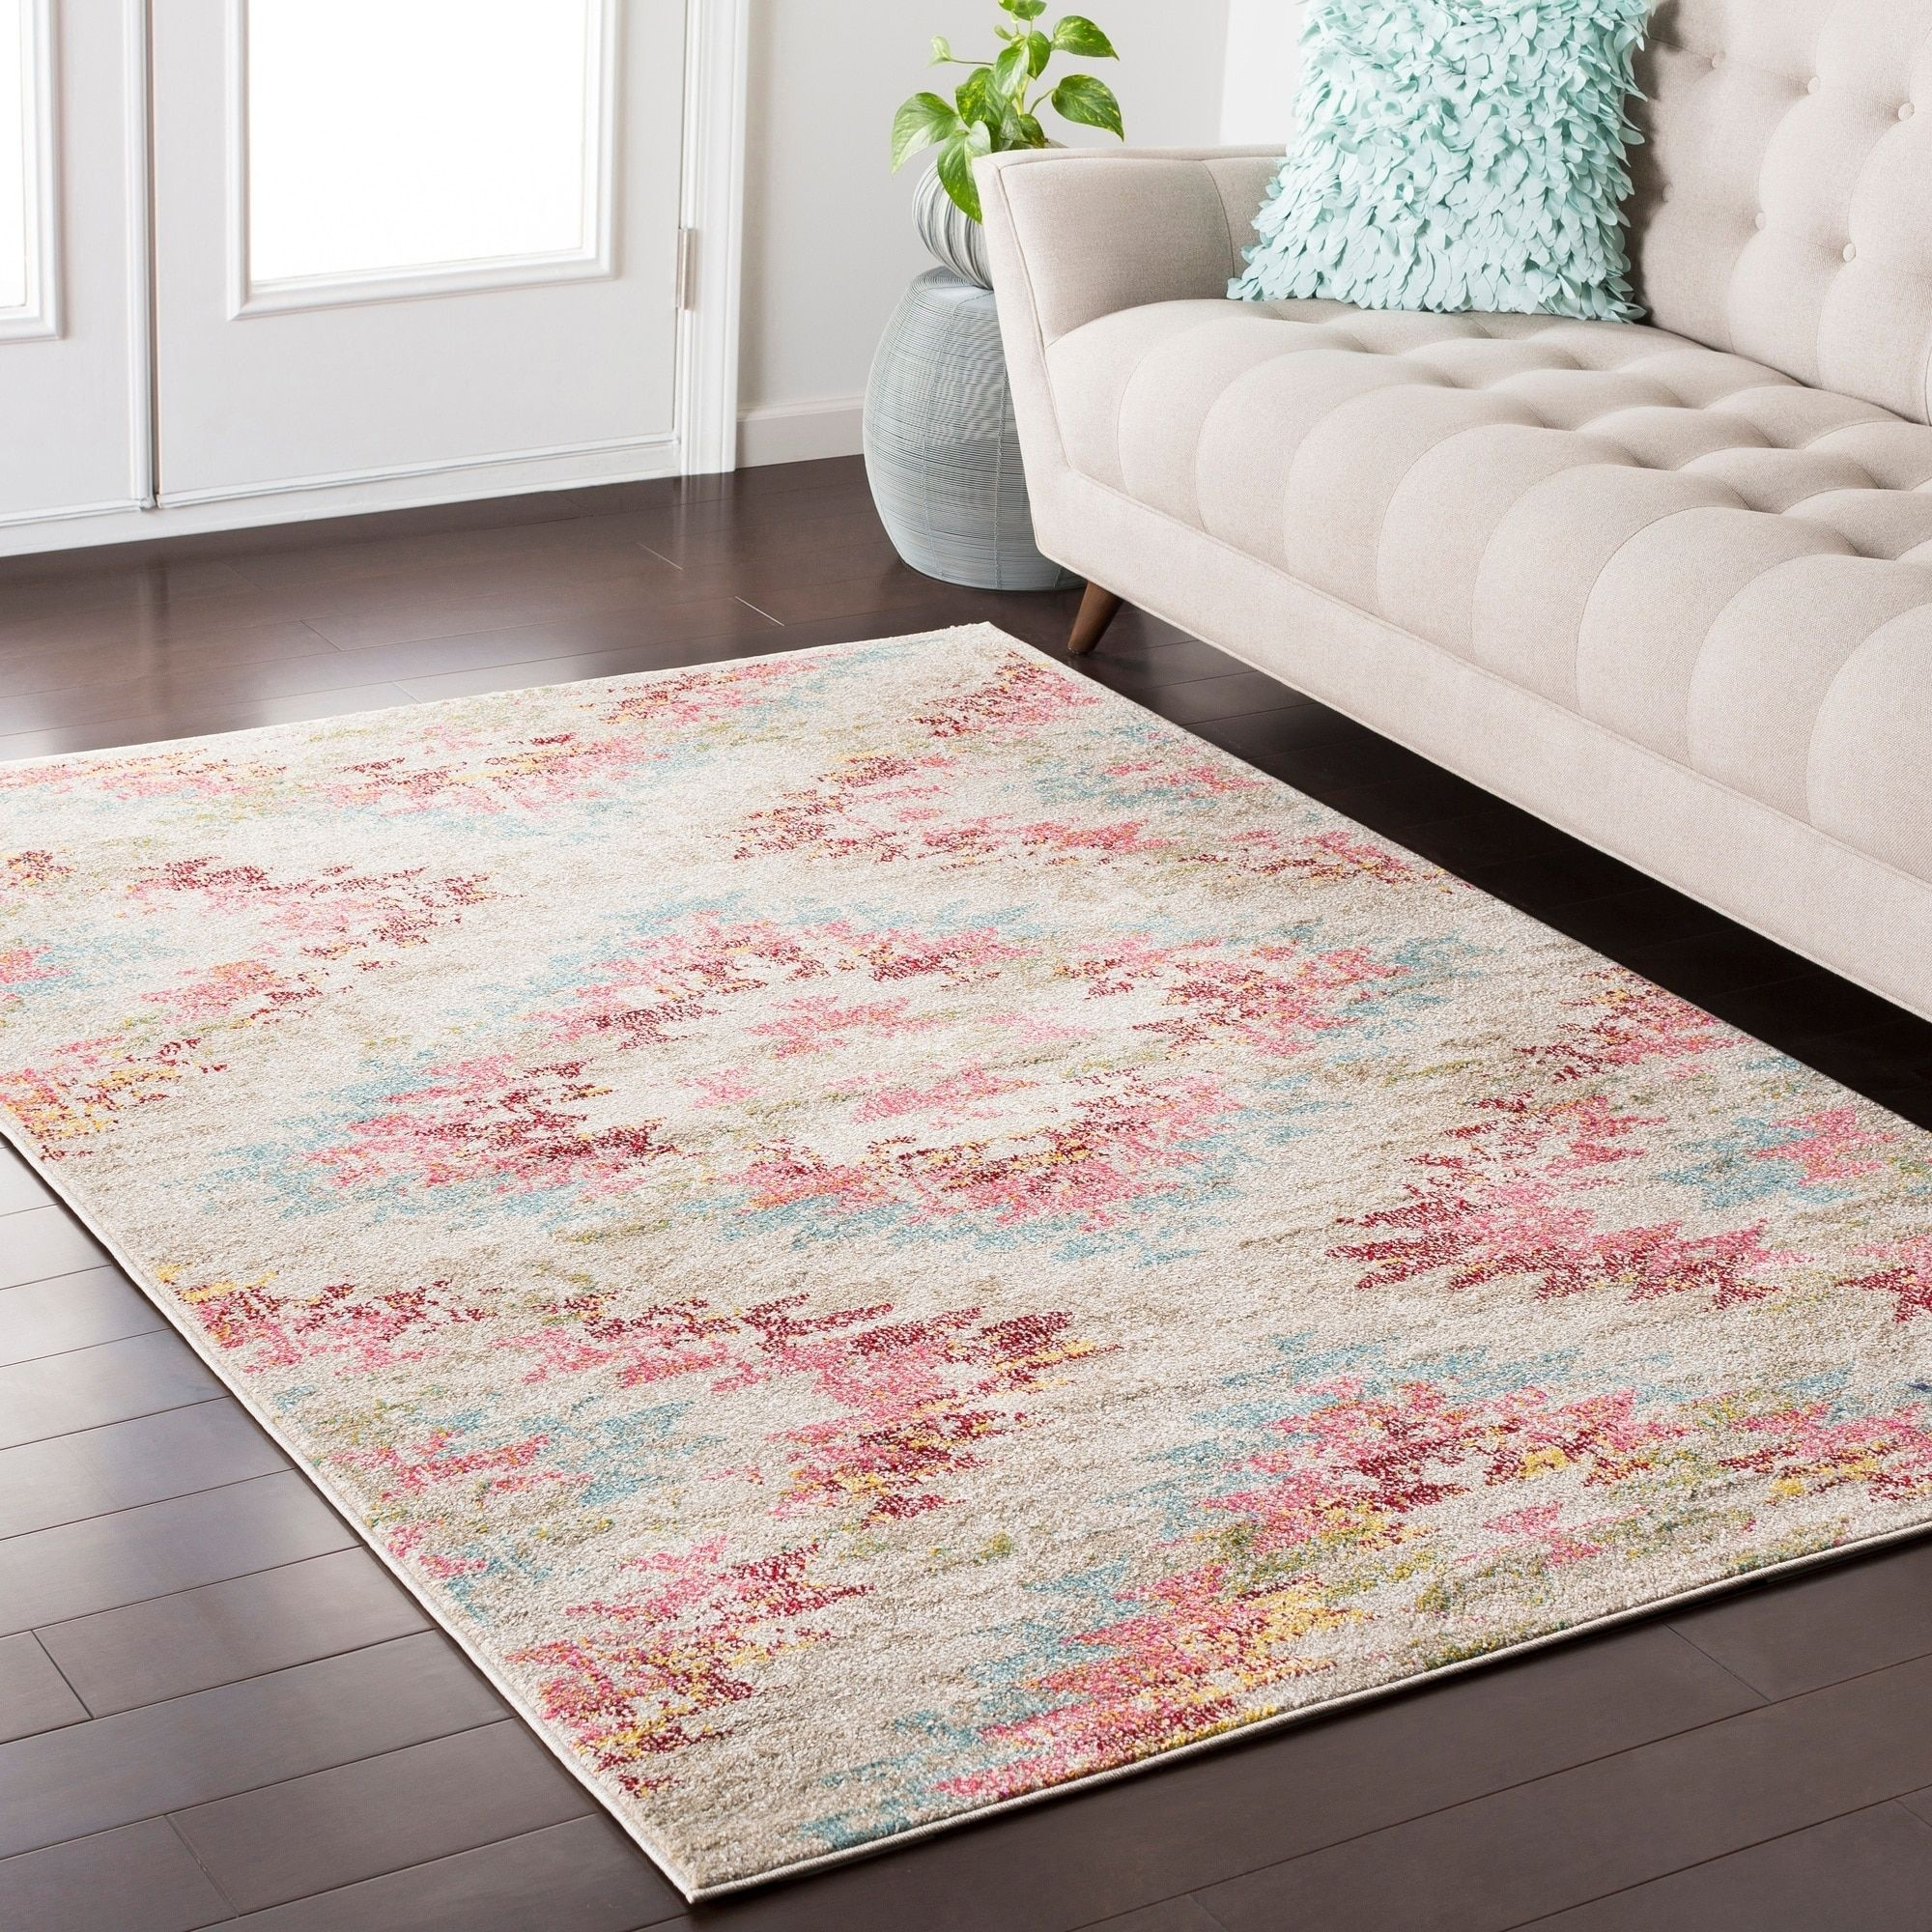 boho modern geometric pastel pink blue area rug 7 10 x 10 3 7 10 x 10 3 pink beige area on boho chic kitchen rugs id=50933